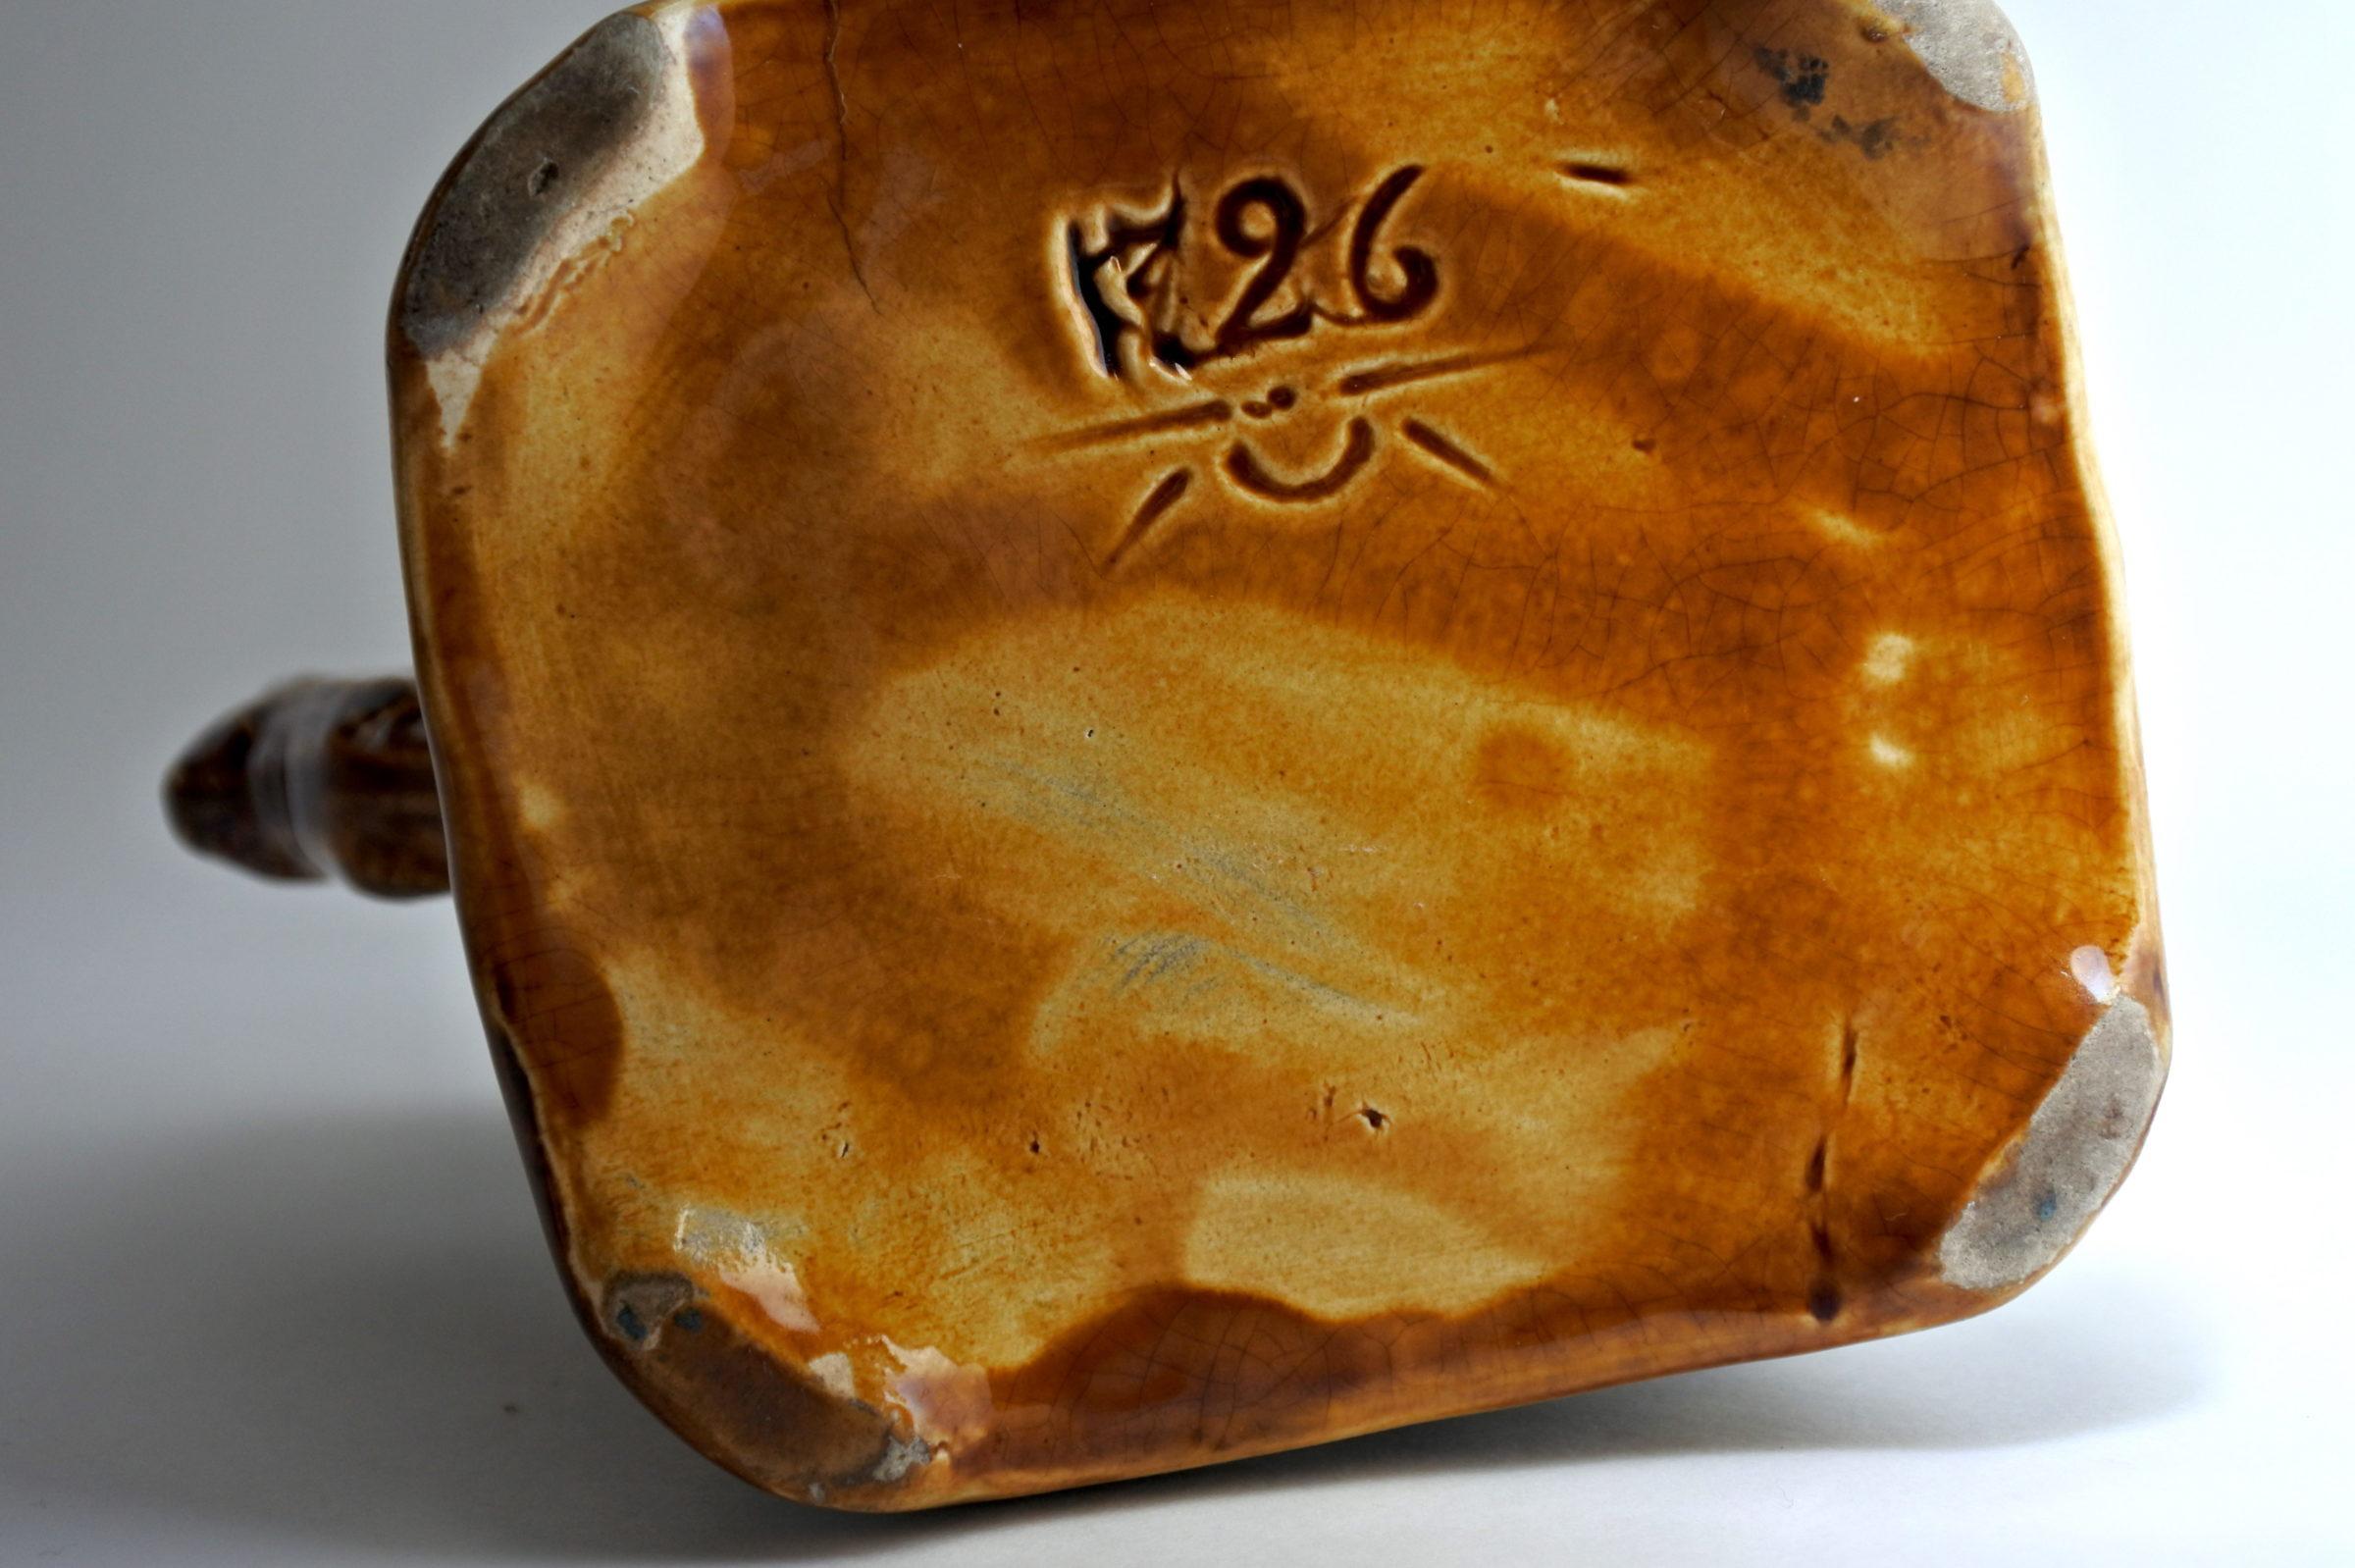 Brocca in ceramica barbotine con ciclamini - Carré cyclamen - 5